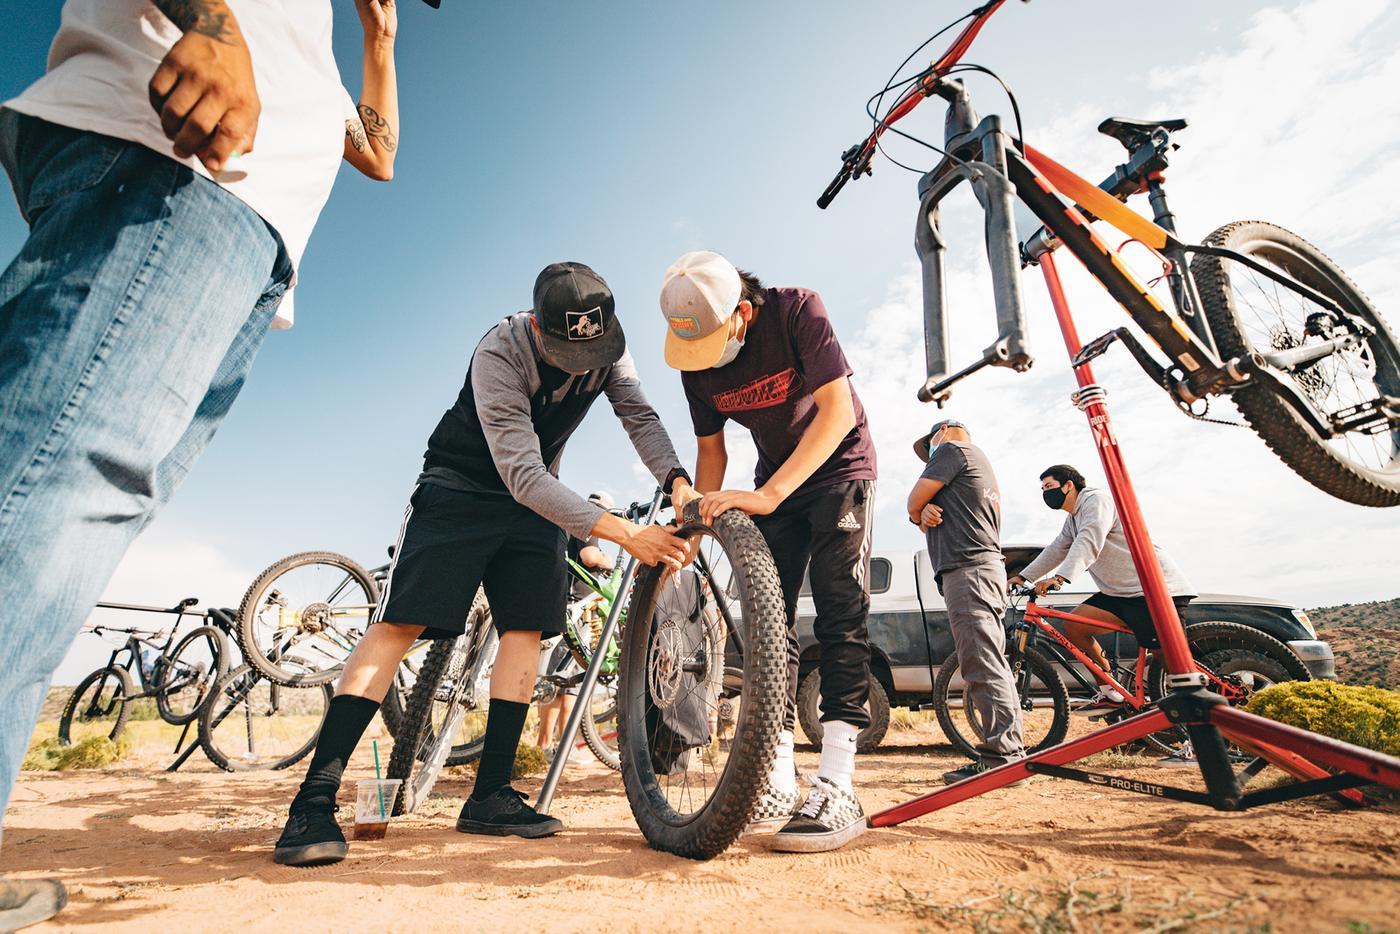 Dzil ta'ah Adventures Navajo Youth Bike-Packrafting Adventure Series: Nazlini, AZ